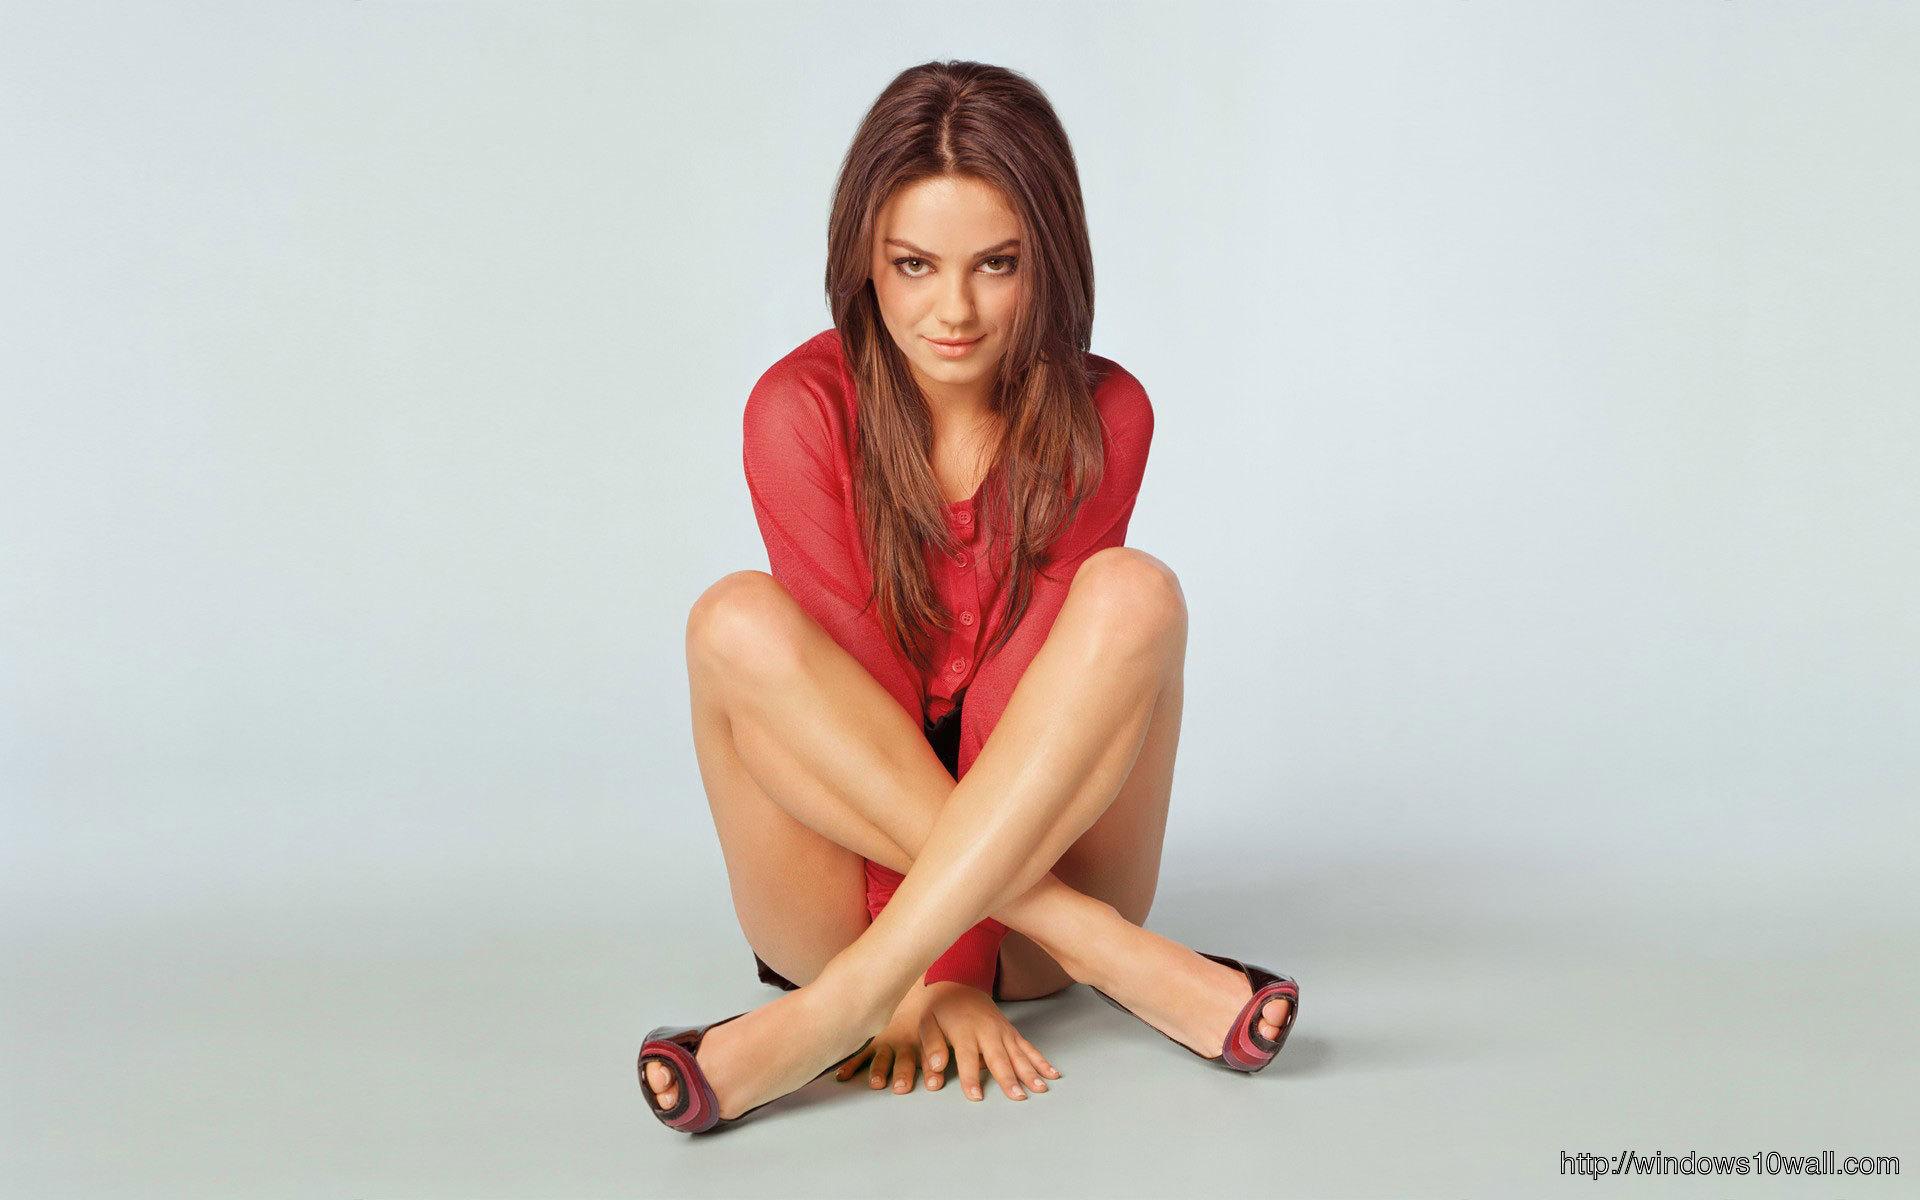 Beautiful-Mila-Kunis-HD-Free-Wallpaper